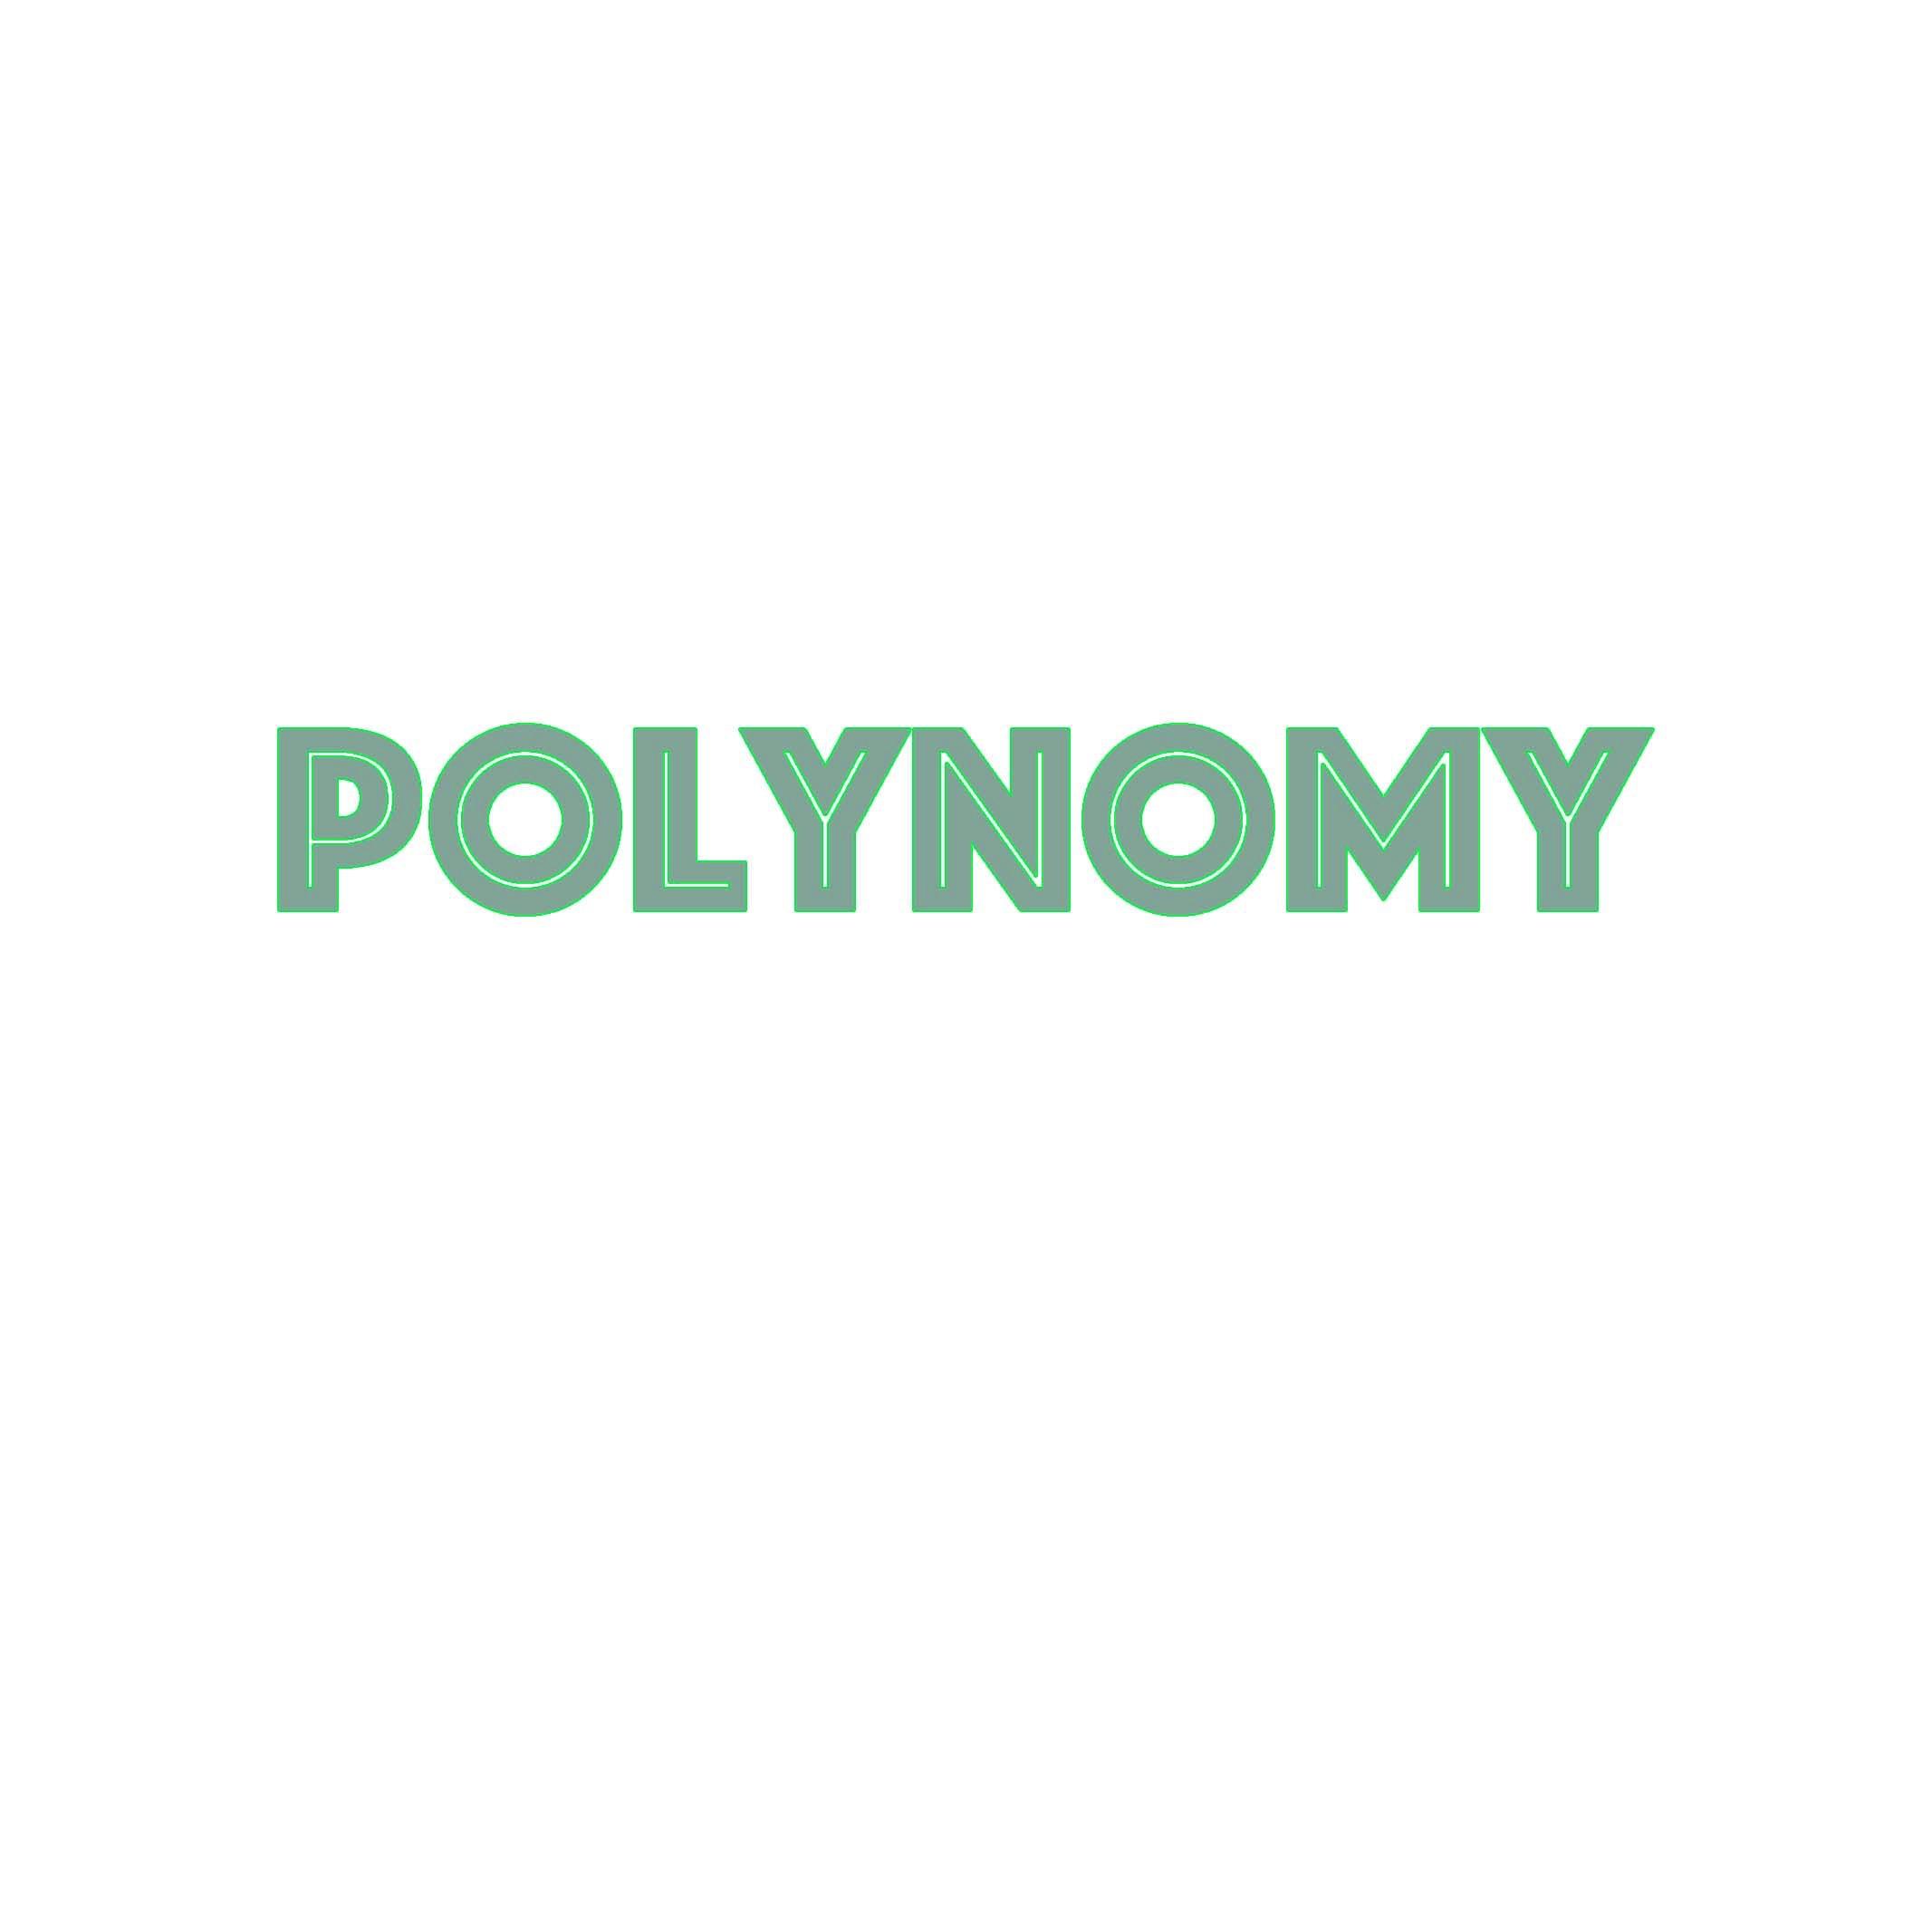 polynomy